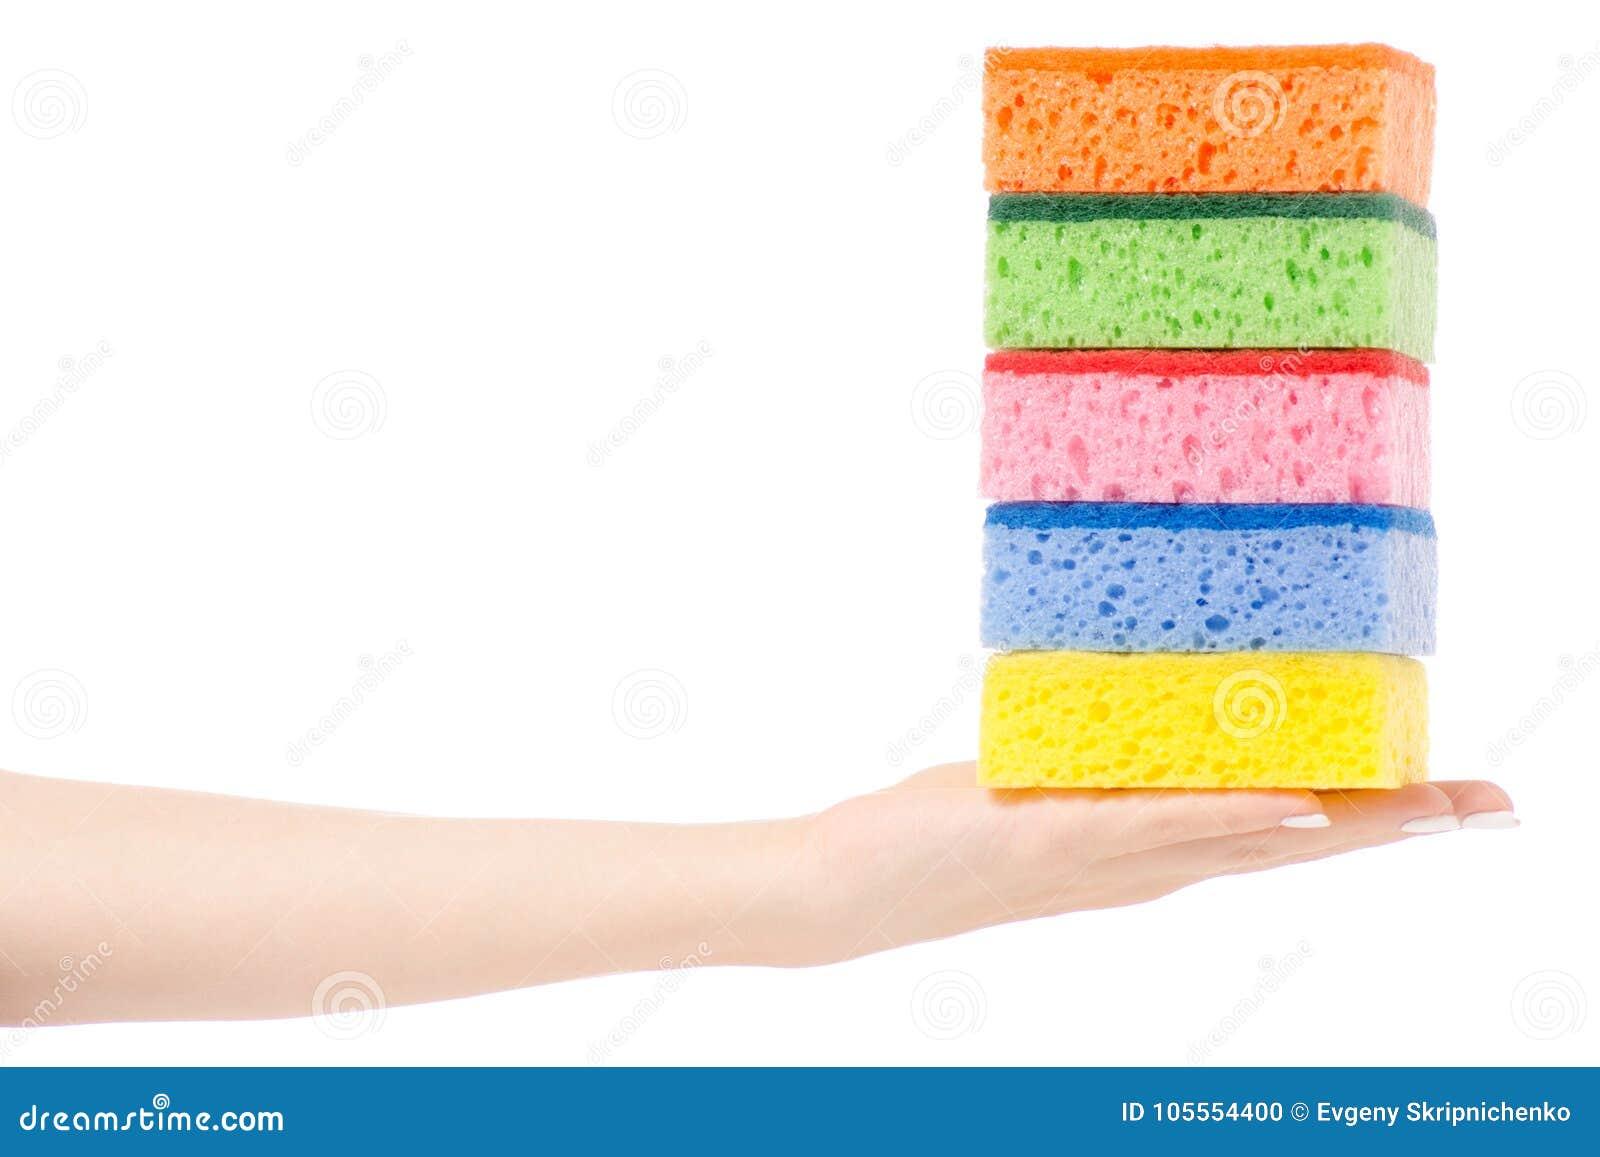 Female Hand Kitchen Dish Sponge For Washing Dishes Stock Photo ...